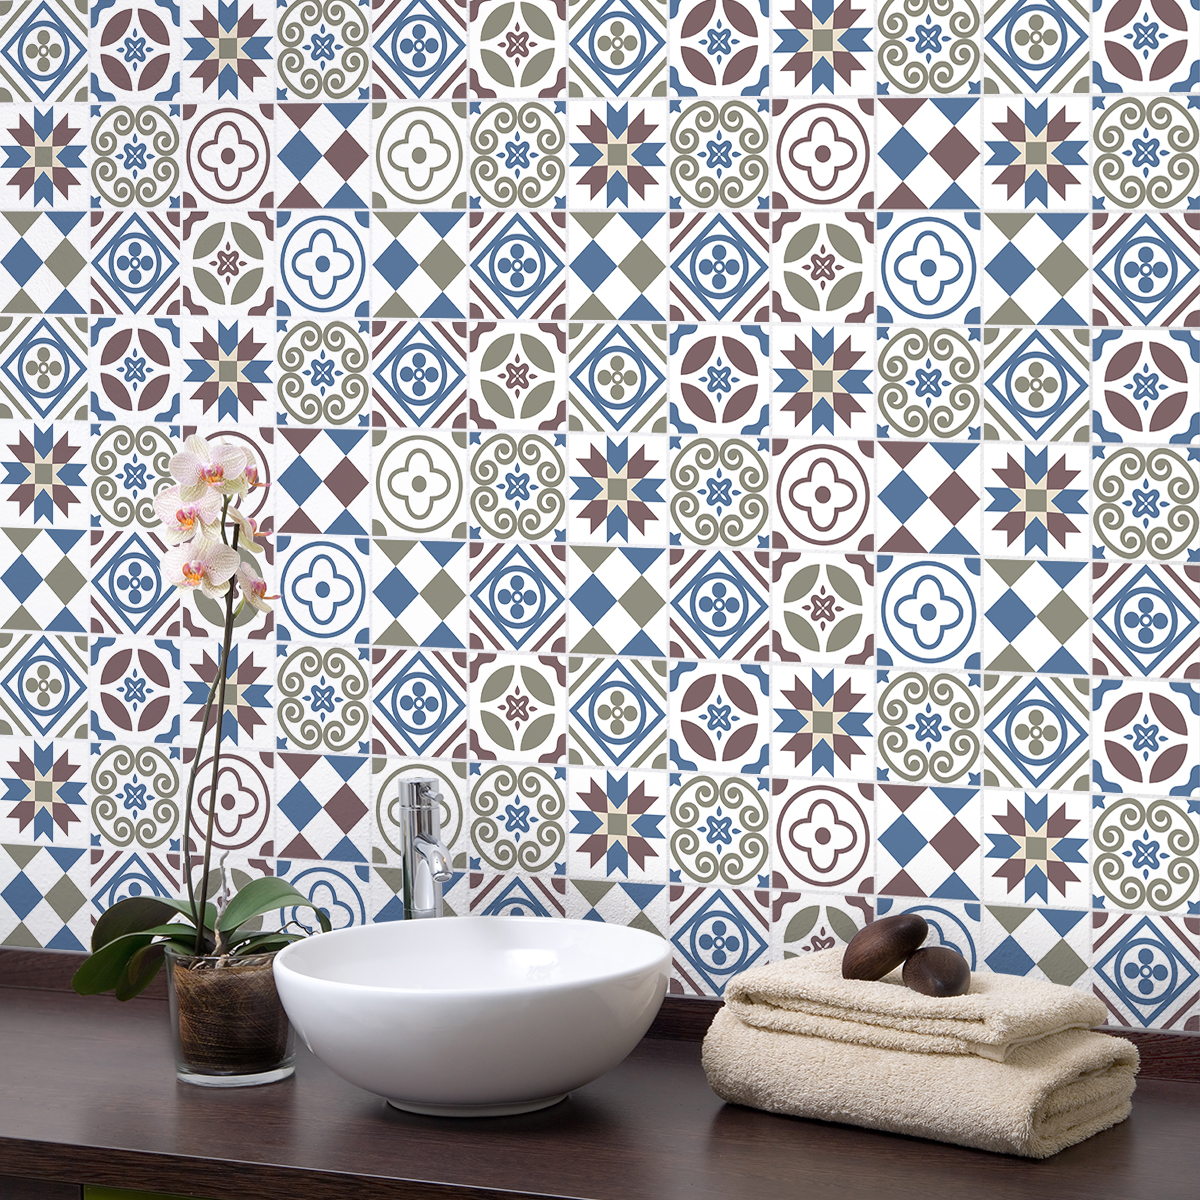 9 stickers carreaux de ciment azulejos liticina cuisine carrelages ambiance sticker. Black Bedroom Furniture Sets. Home Design Ideas